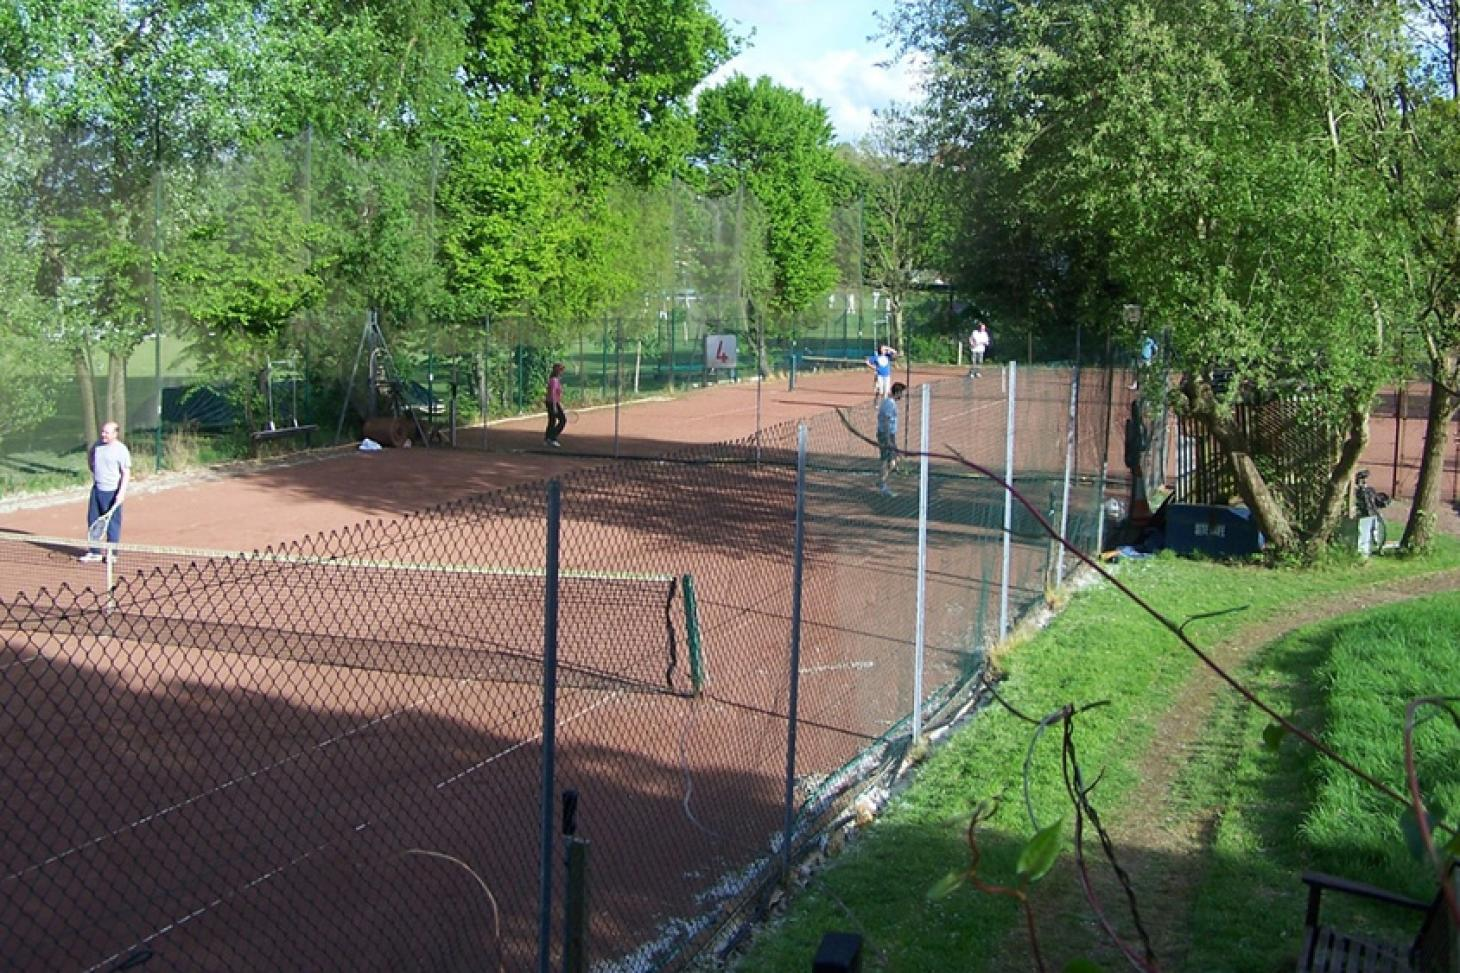 Hanley Lawn Tennis Club Outdoor | Clay tennis court